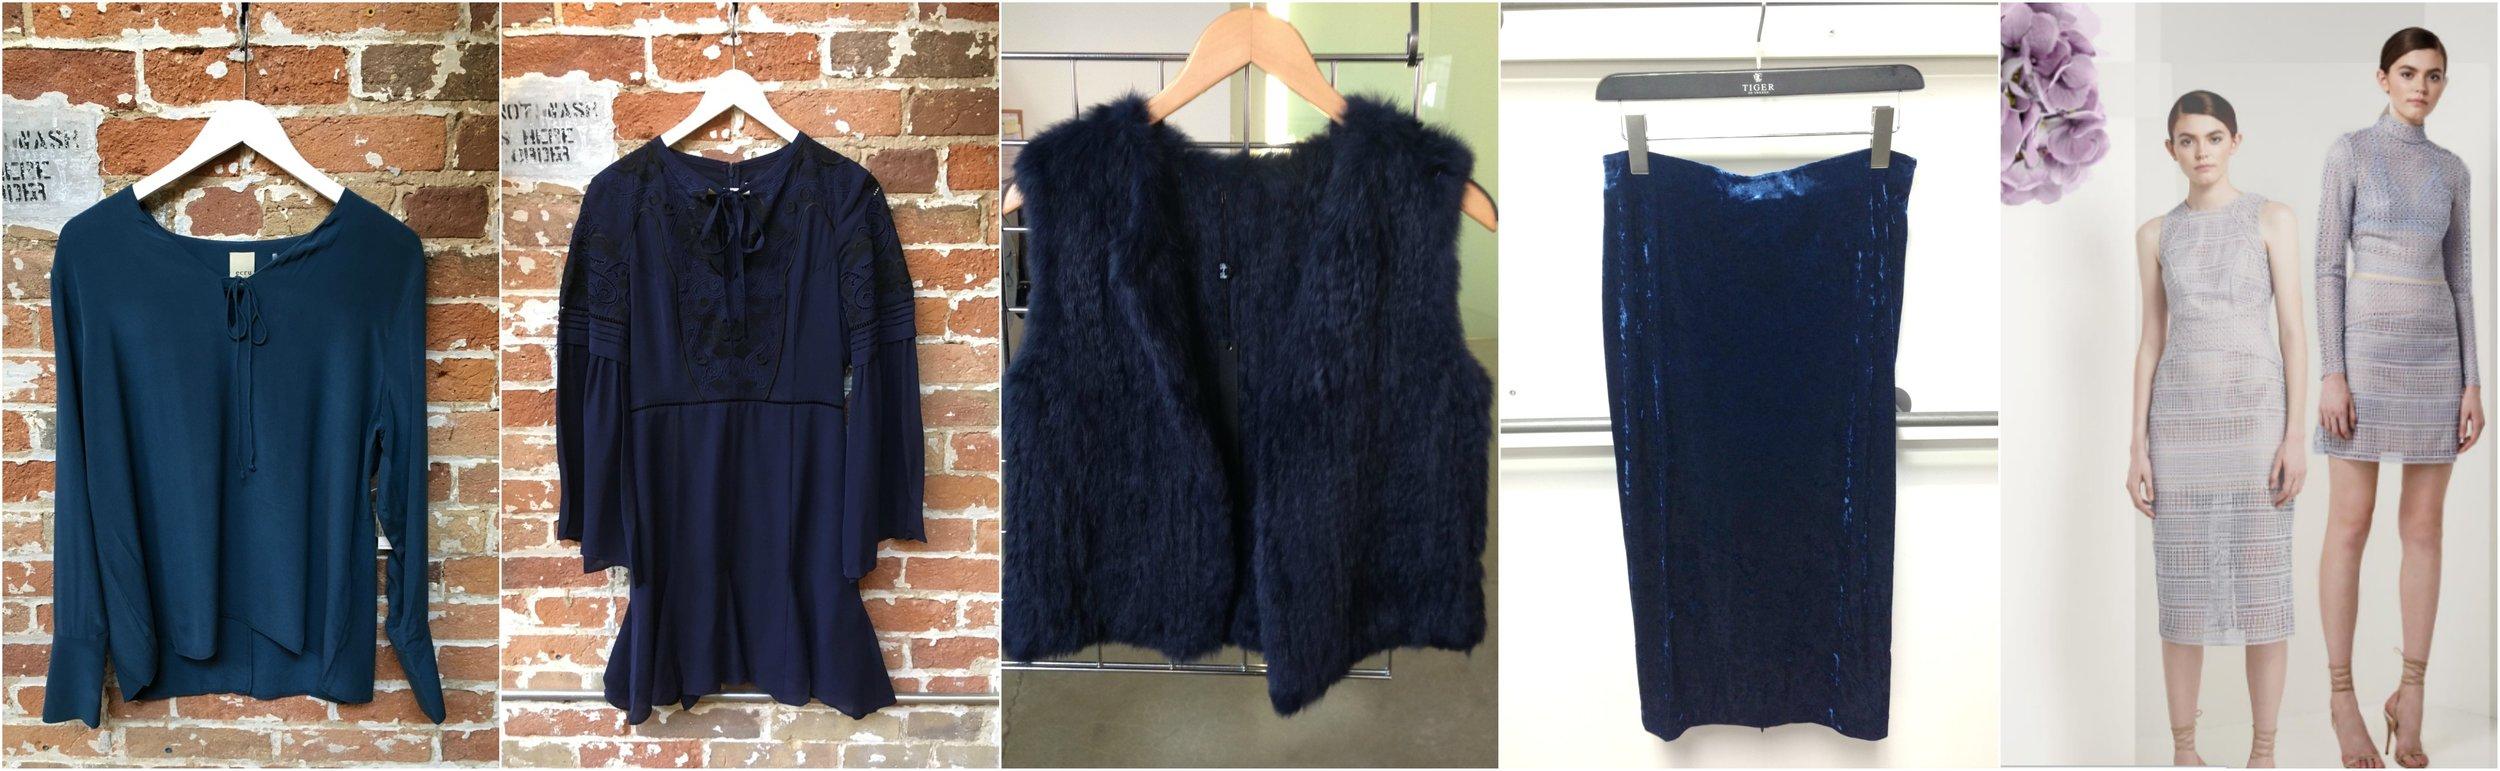 Ecru lace up silk blouse, Parker silk romper, Lyle & Luxe fur vest, Tiger of Sweden velvet skirt (coming soon), Keepsake lace set (coming soon)